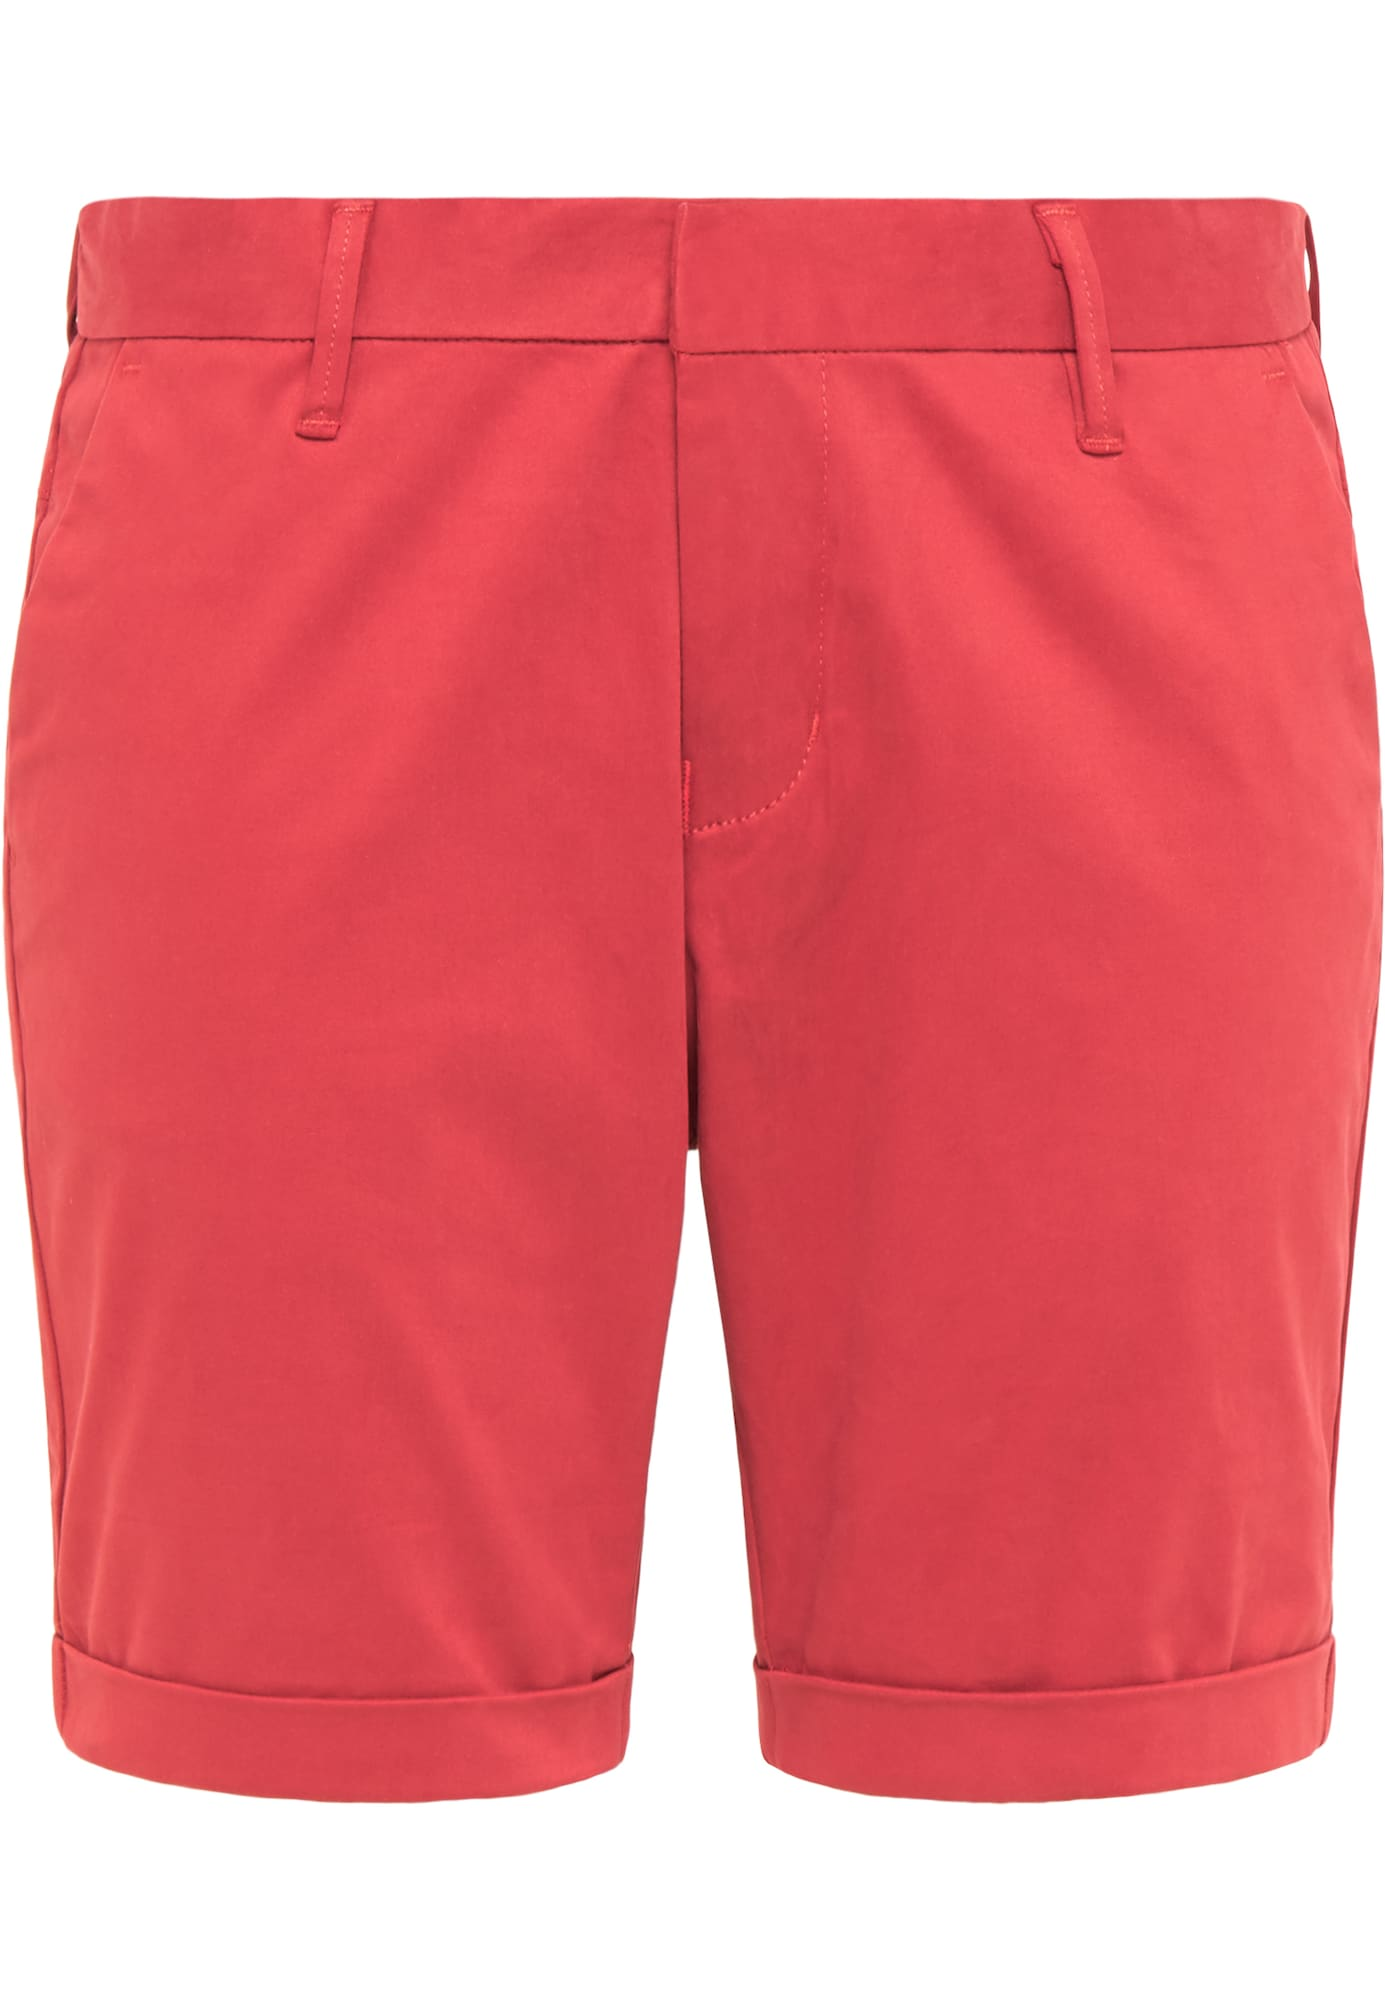 DreiMaster Maritim Kelnės ugnies raudona